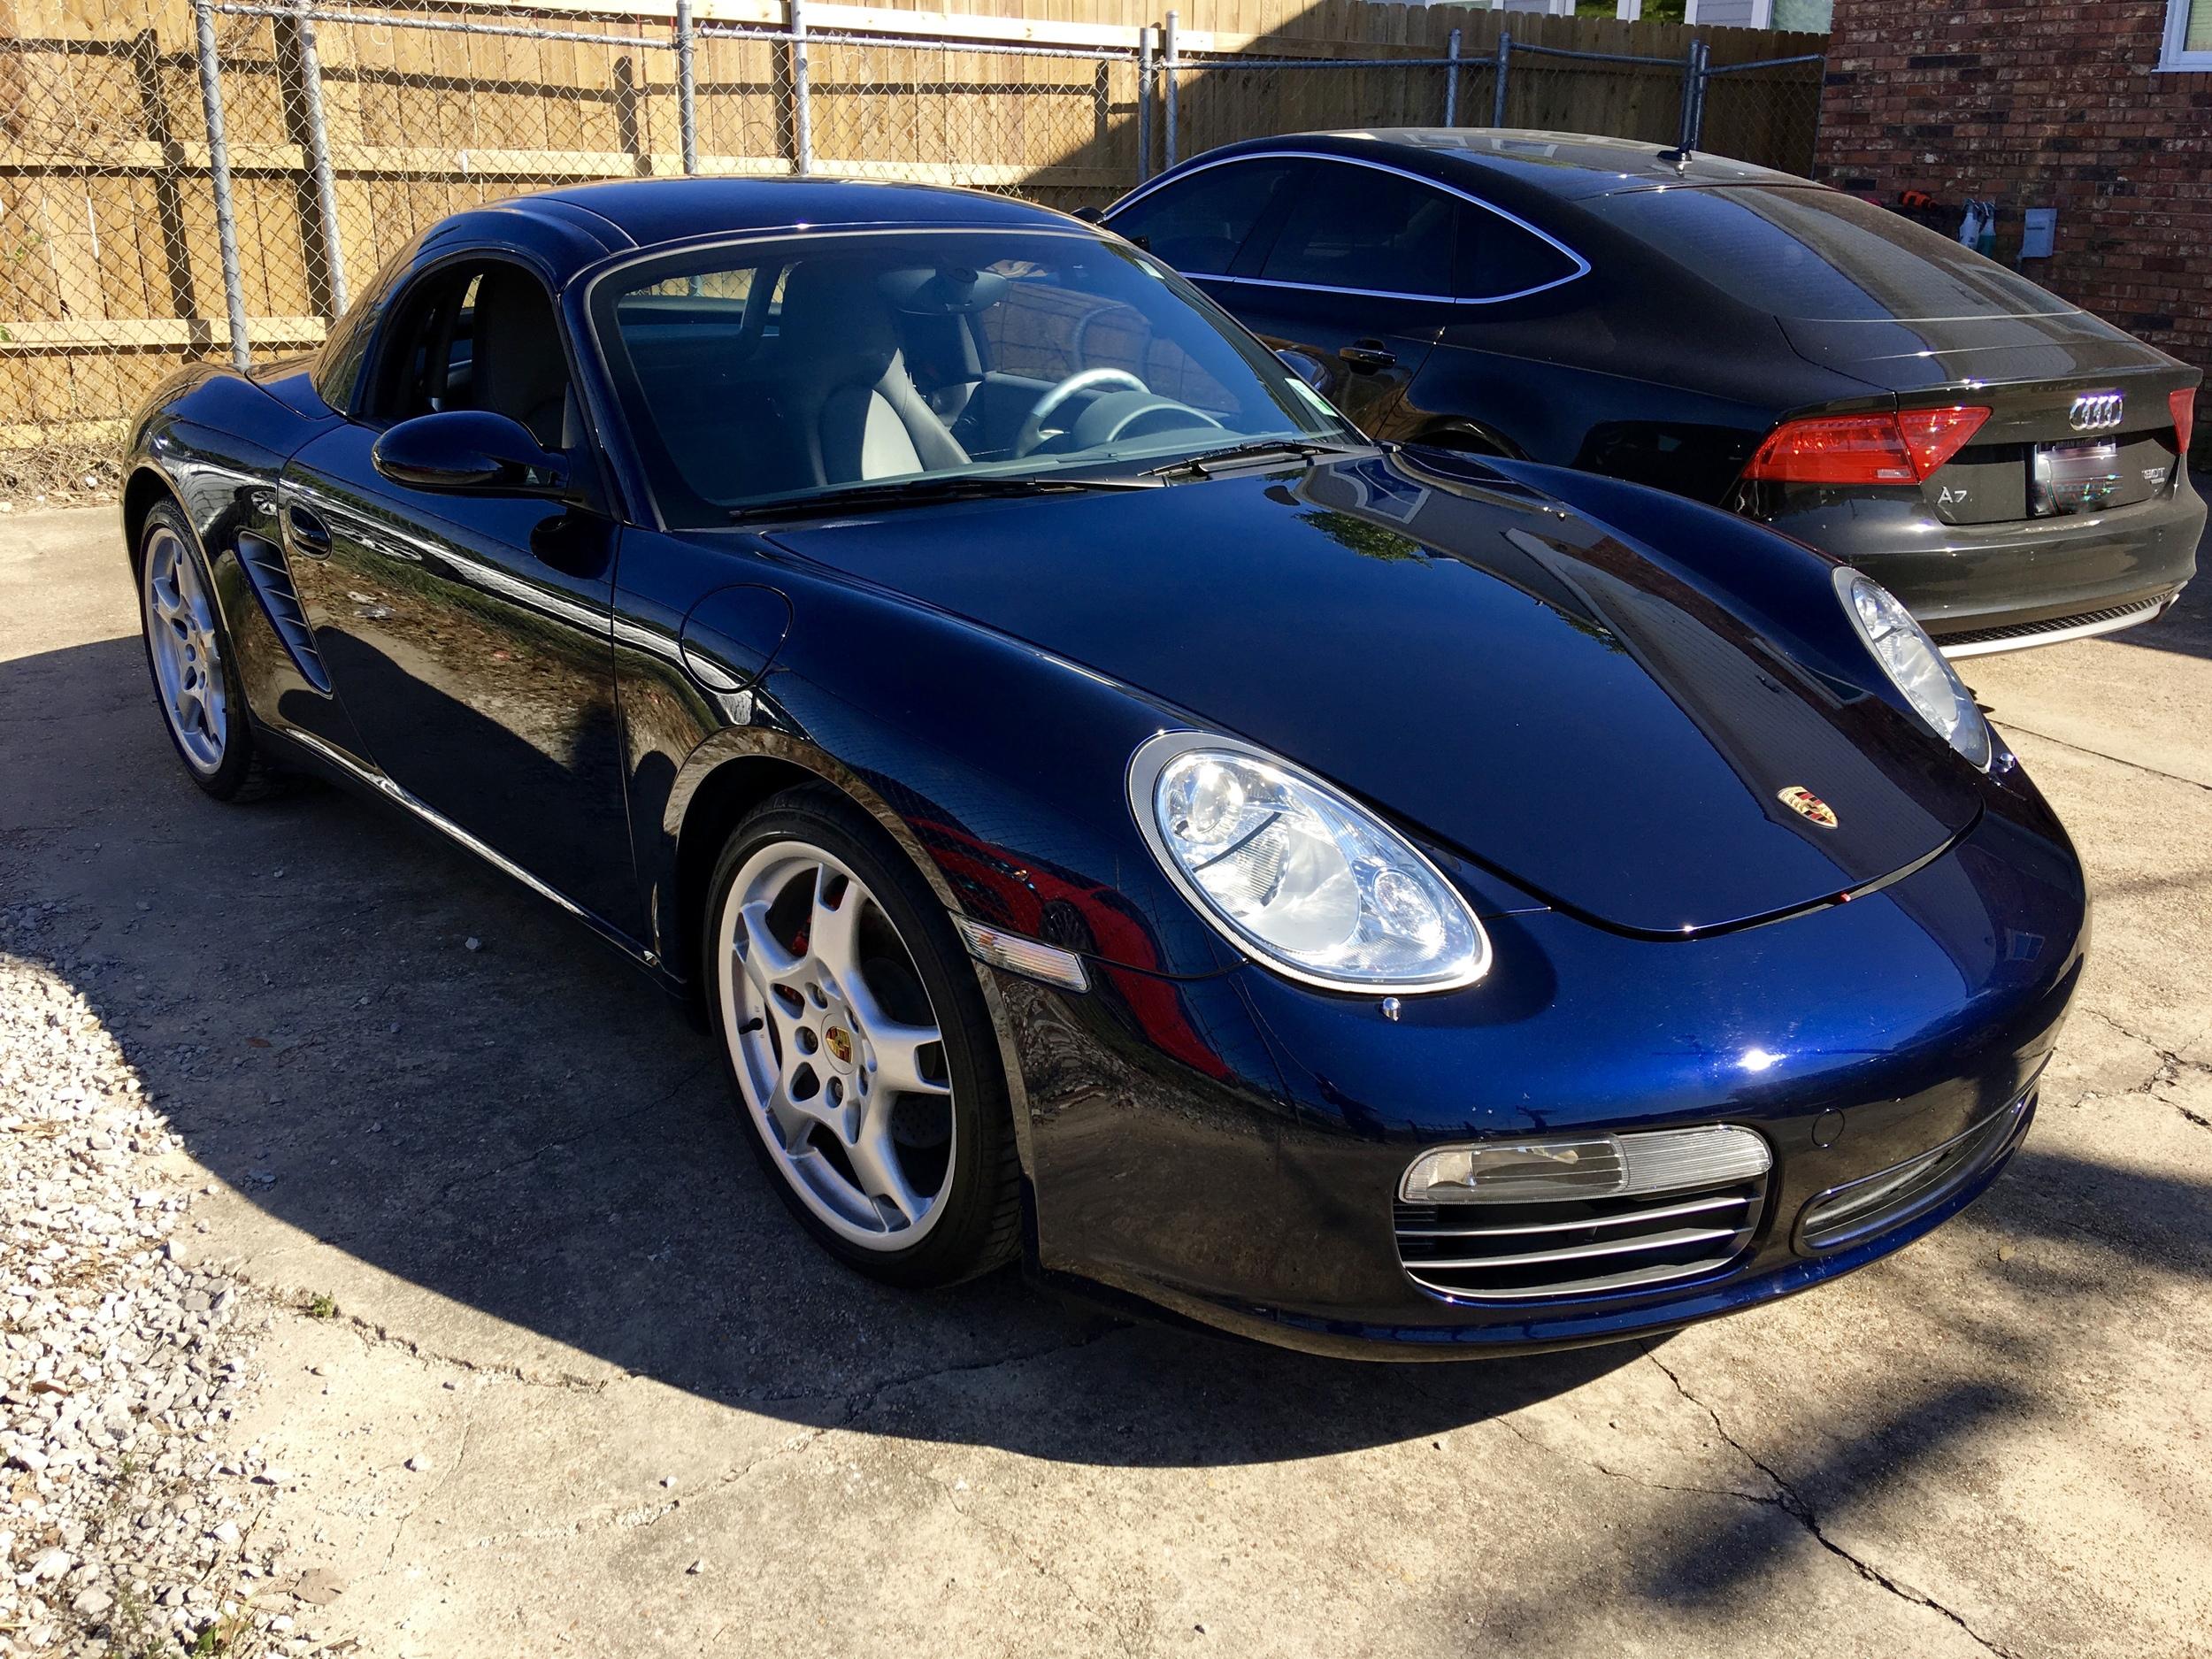 Porsche Boxster S (New Car Slate)